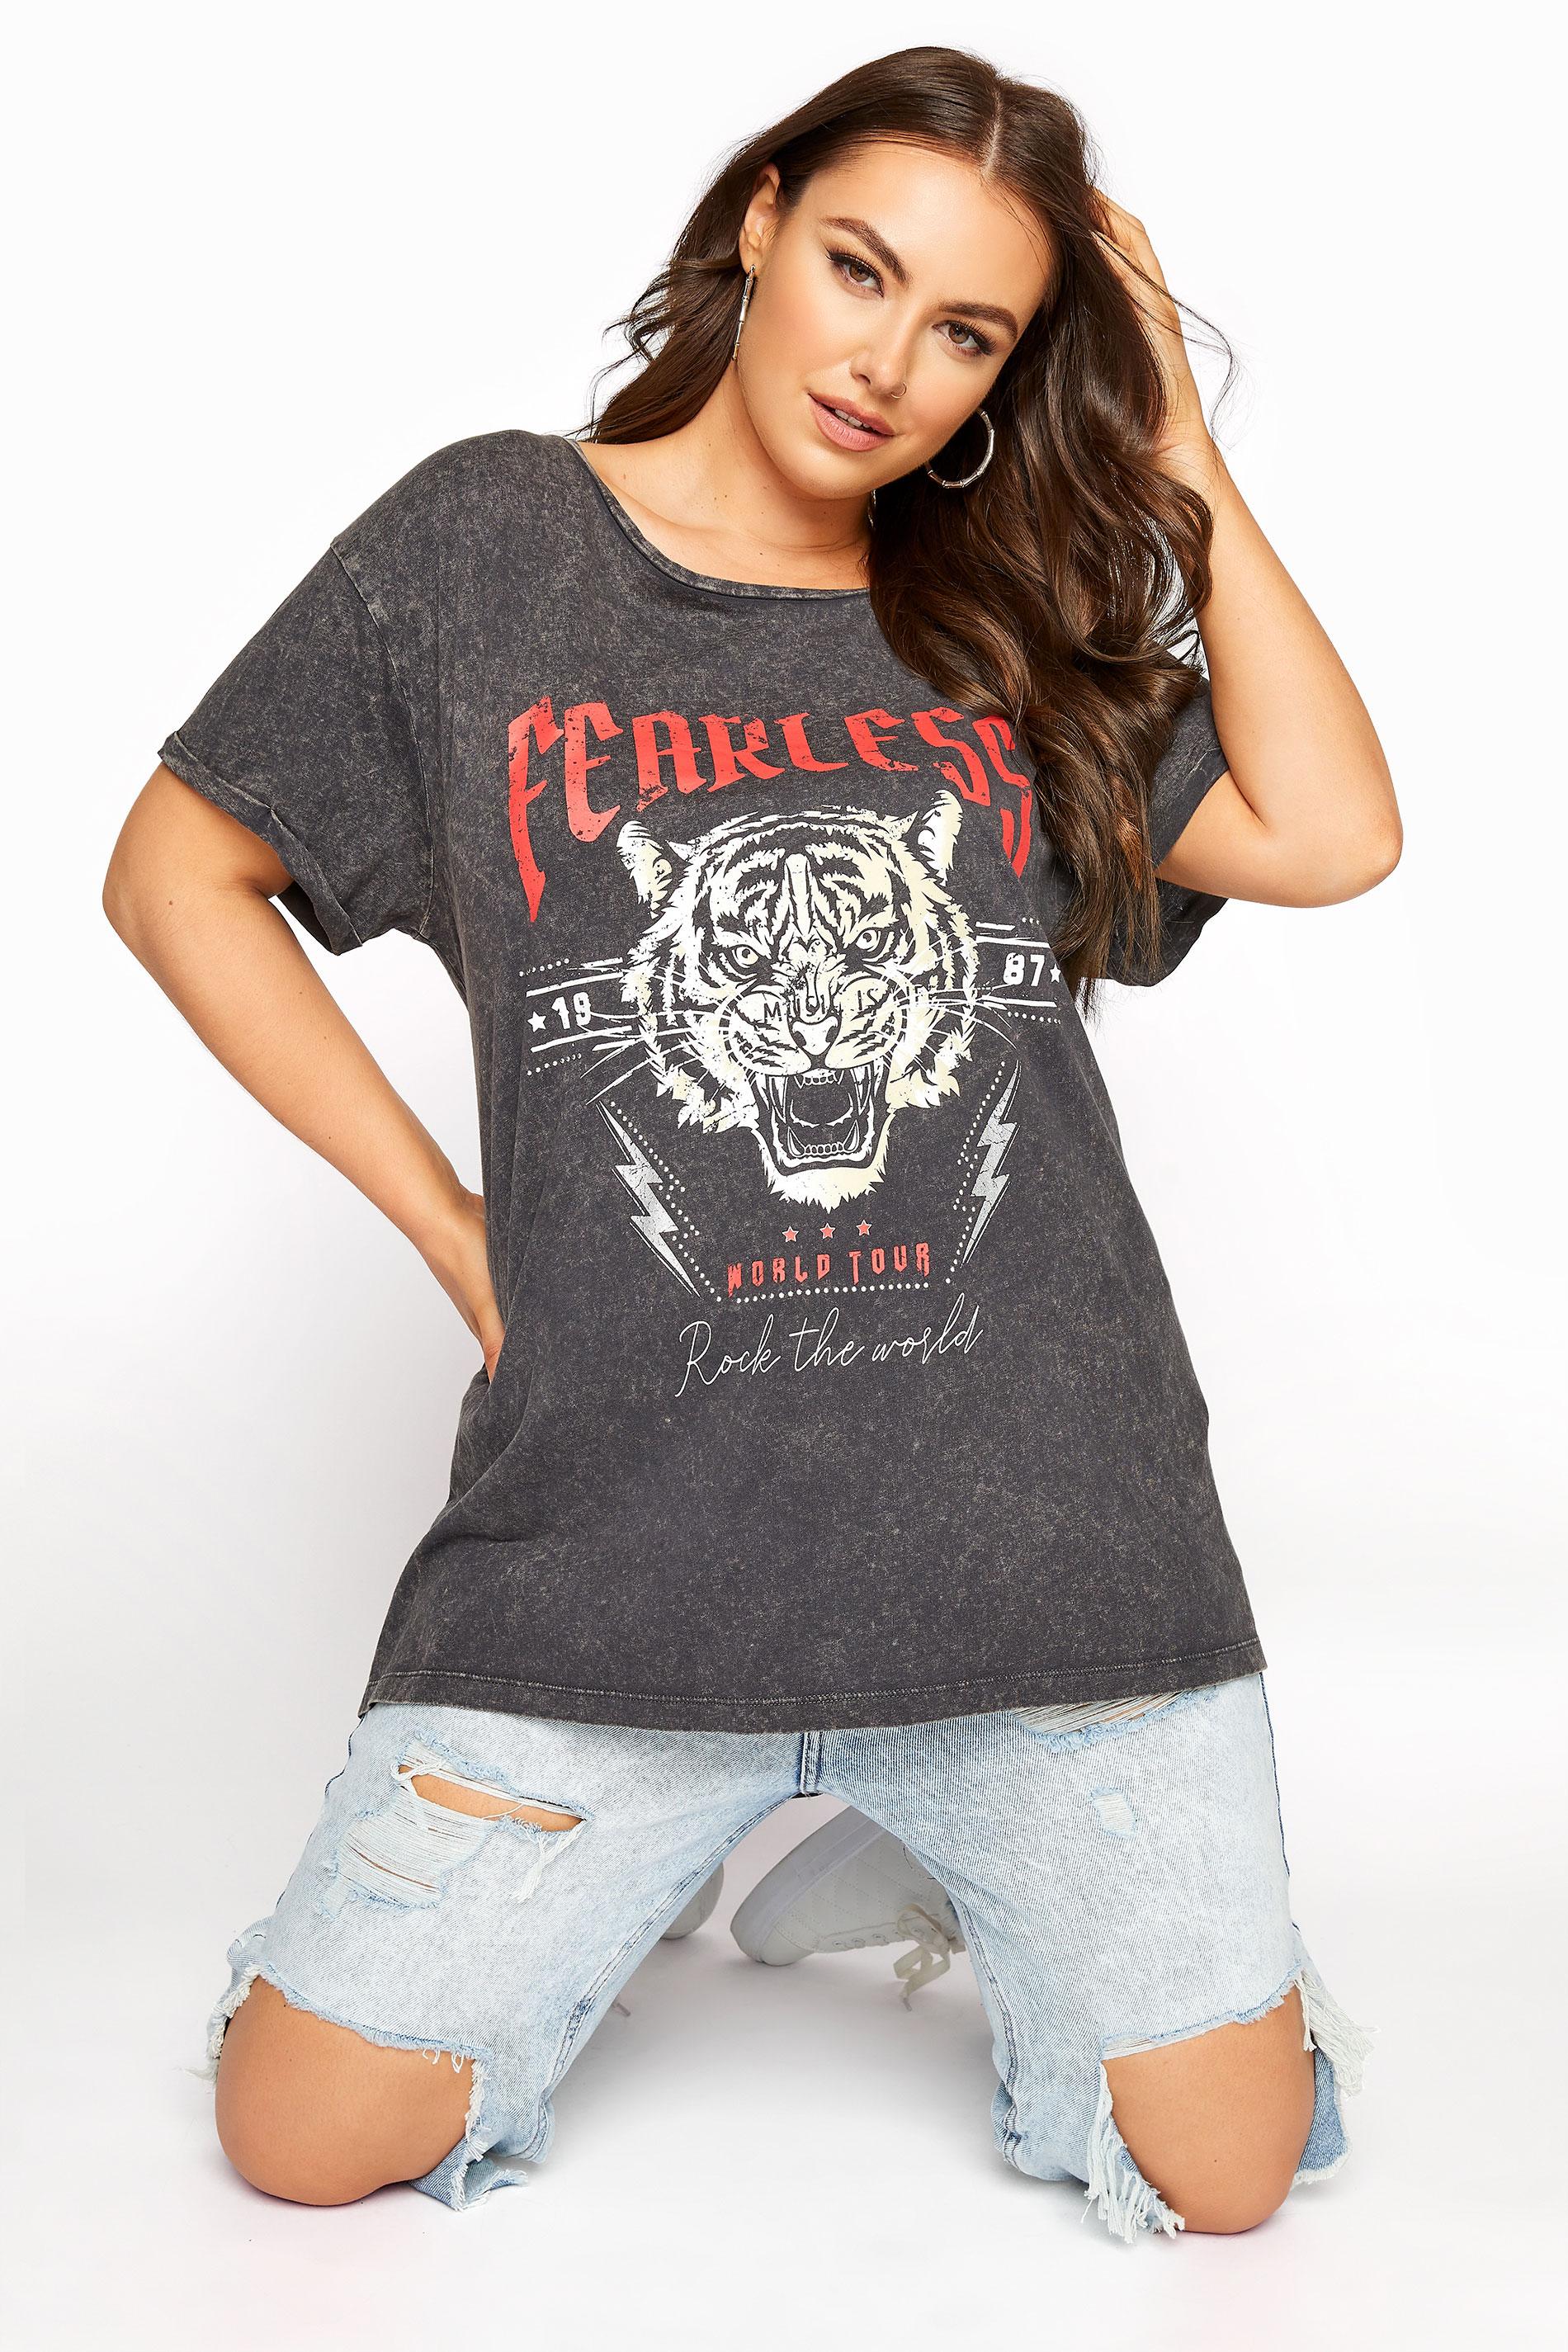 Black Acid Wash 'Fearless' Slogan Graphic T-shirt